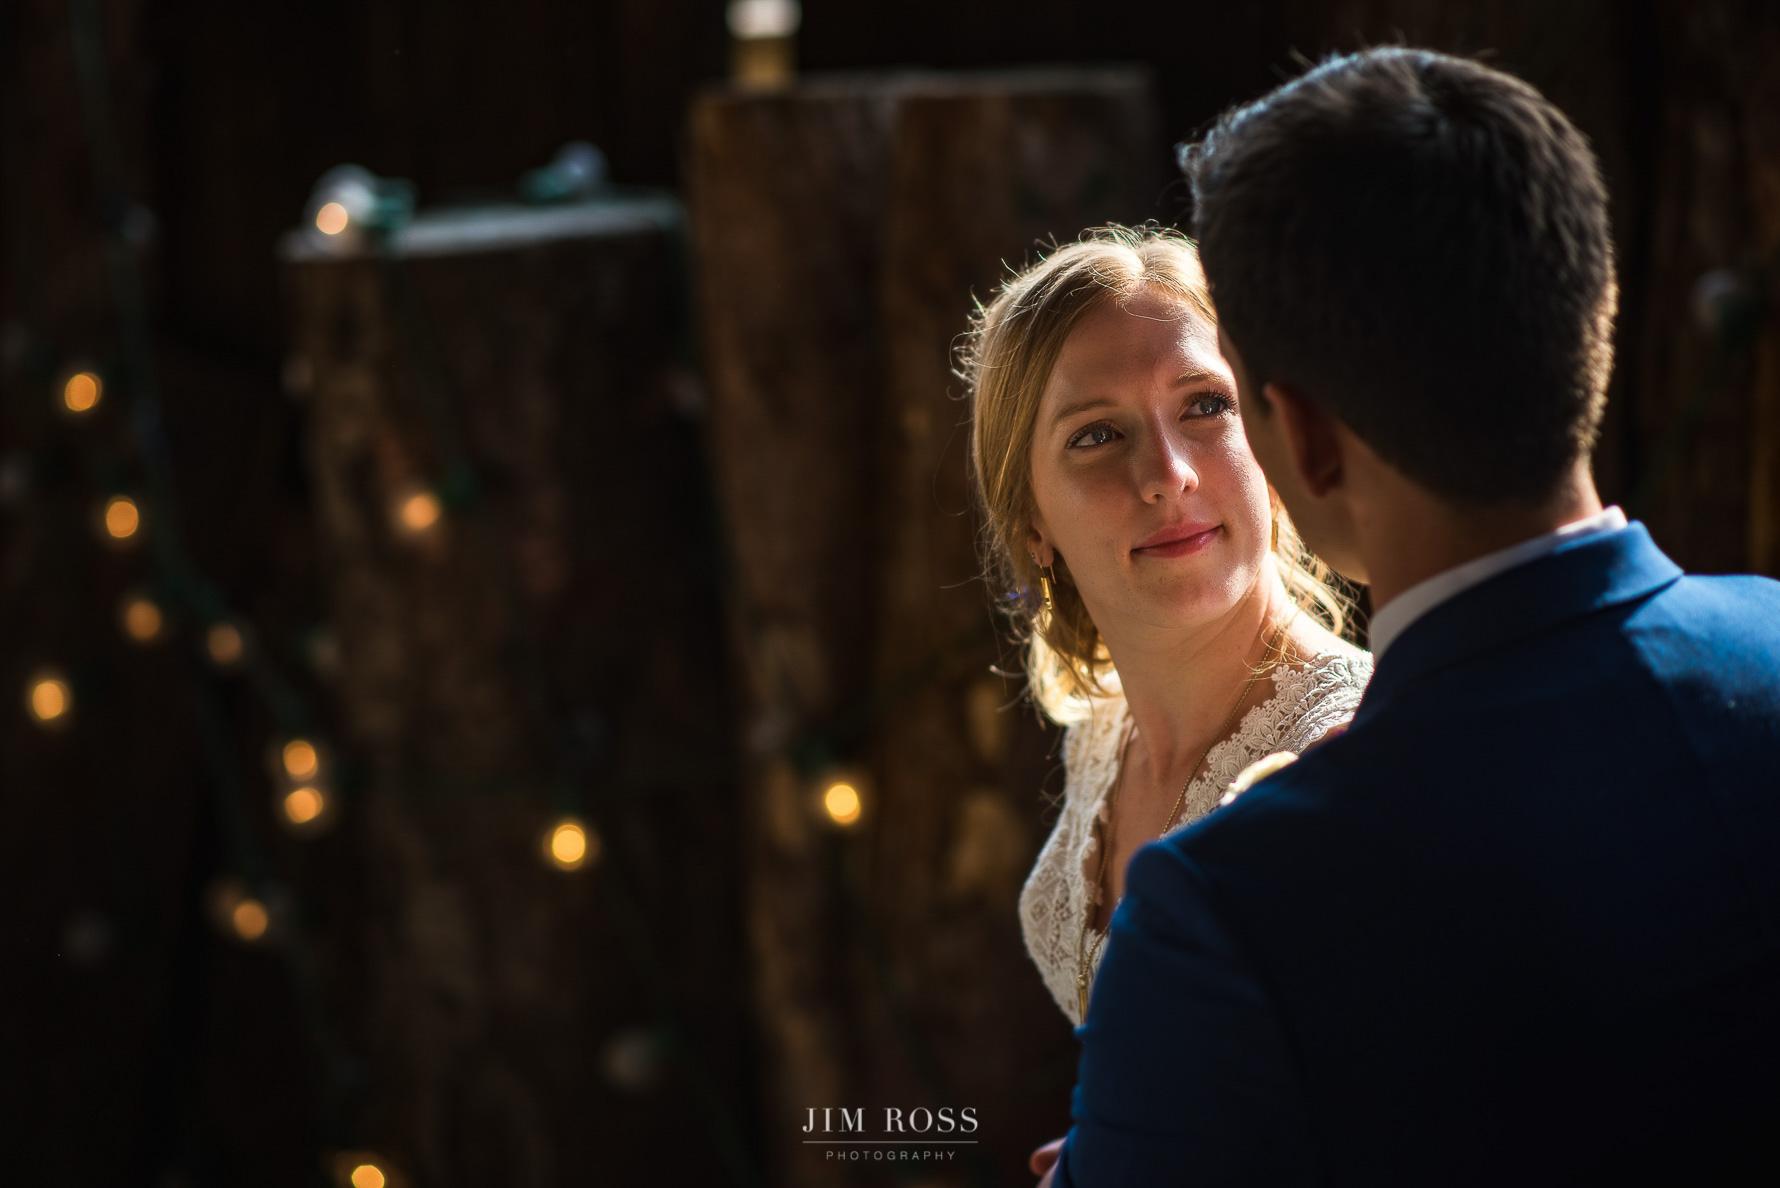 Bride looks lovingly at new husband